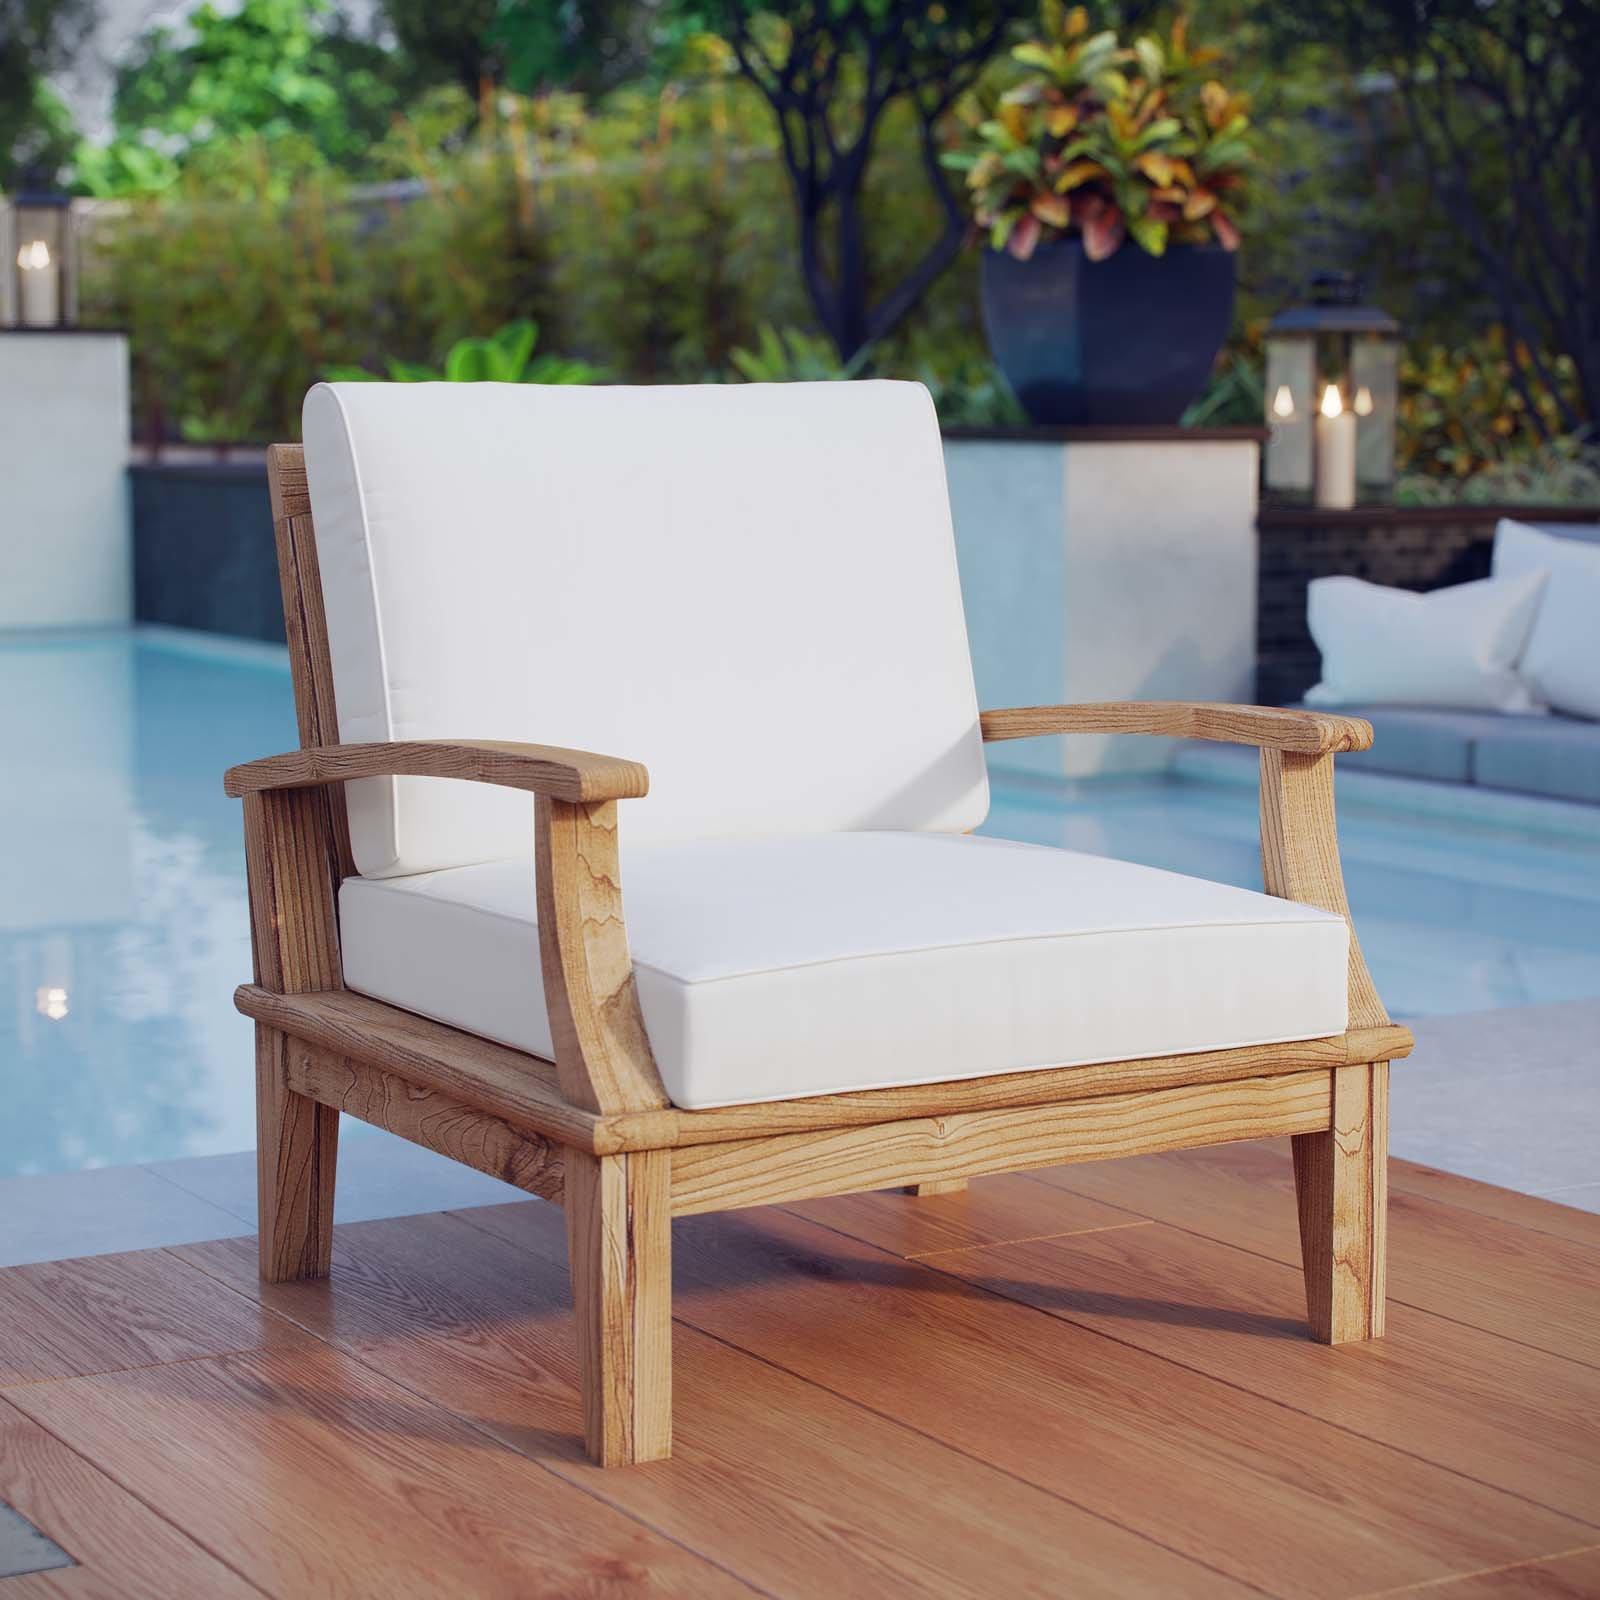 Teak Outdoor Furniture